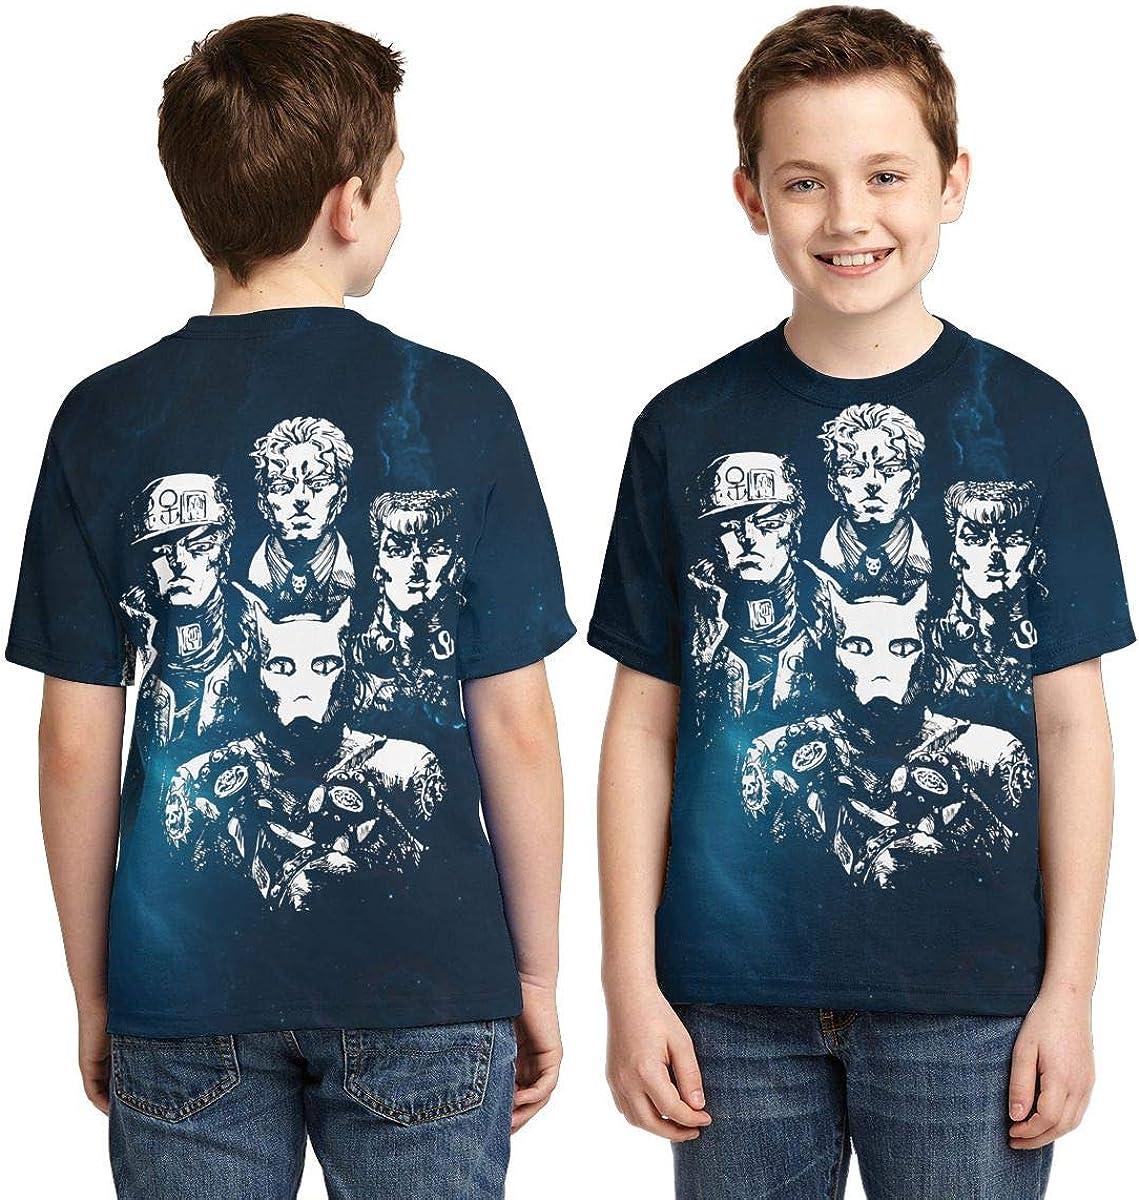 Zengqinglove Boys,Girls,Youth Jojos Bizarre Adventure T Shirts